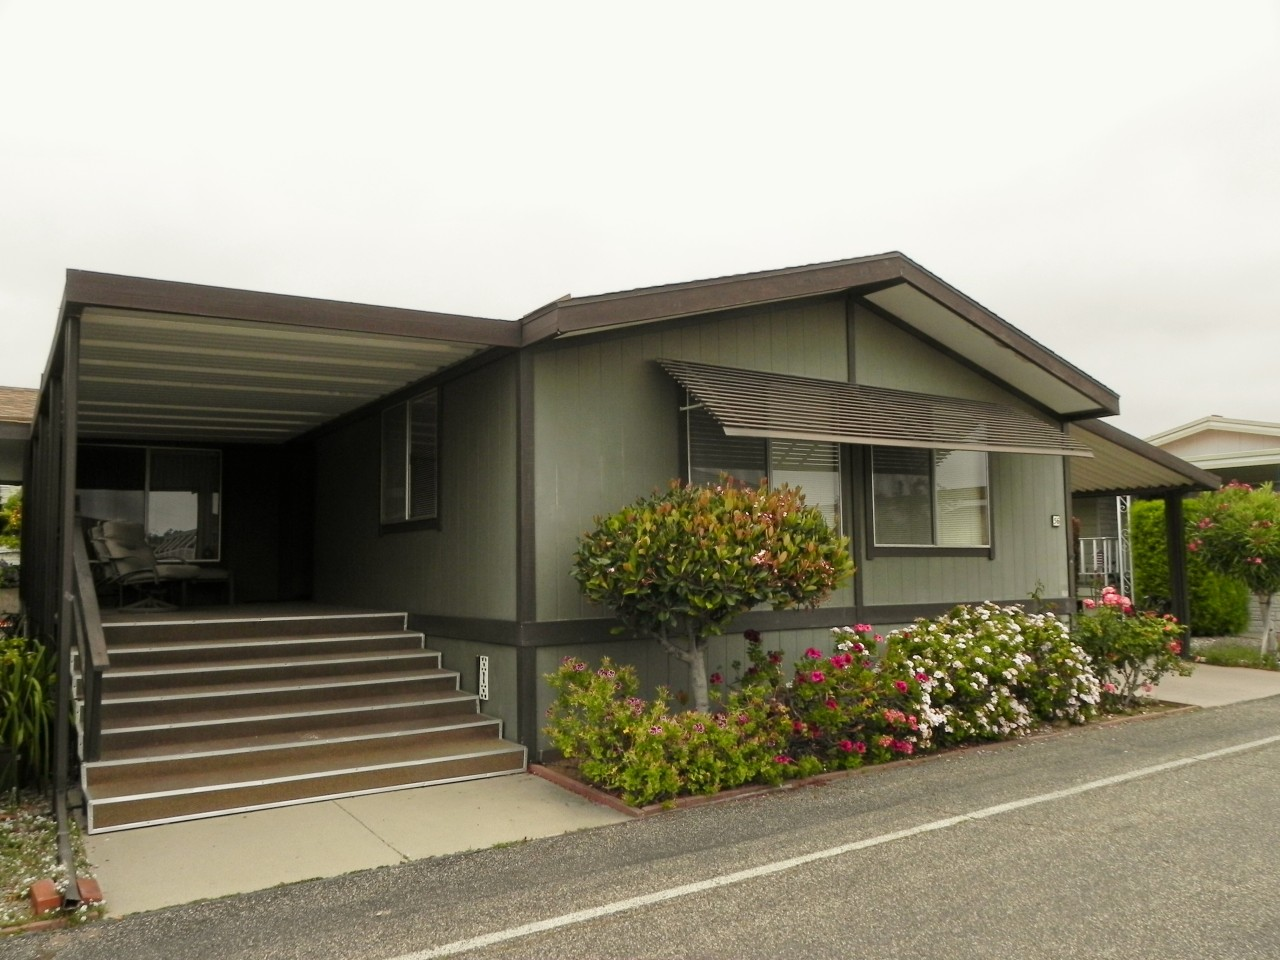 Property photo for 340 Old Mill RD #56 Santa Barbara, California 93110 - 12-1425